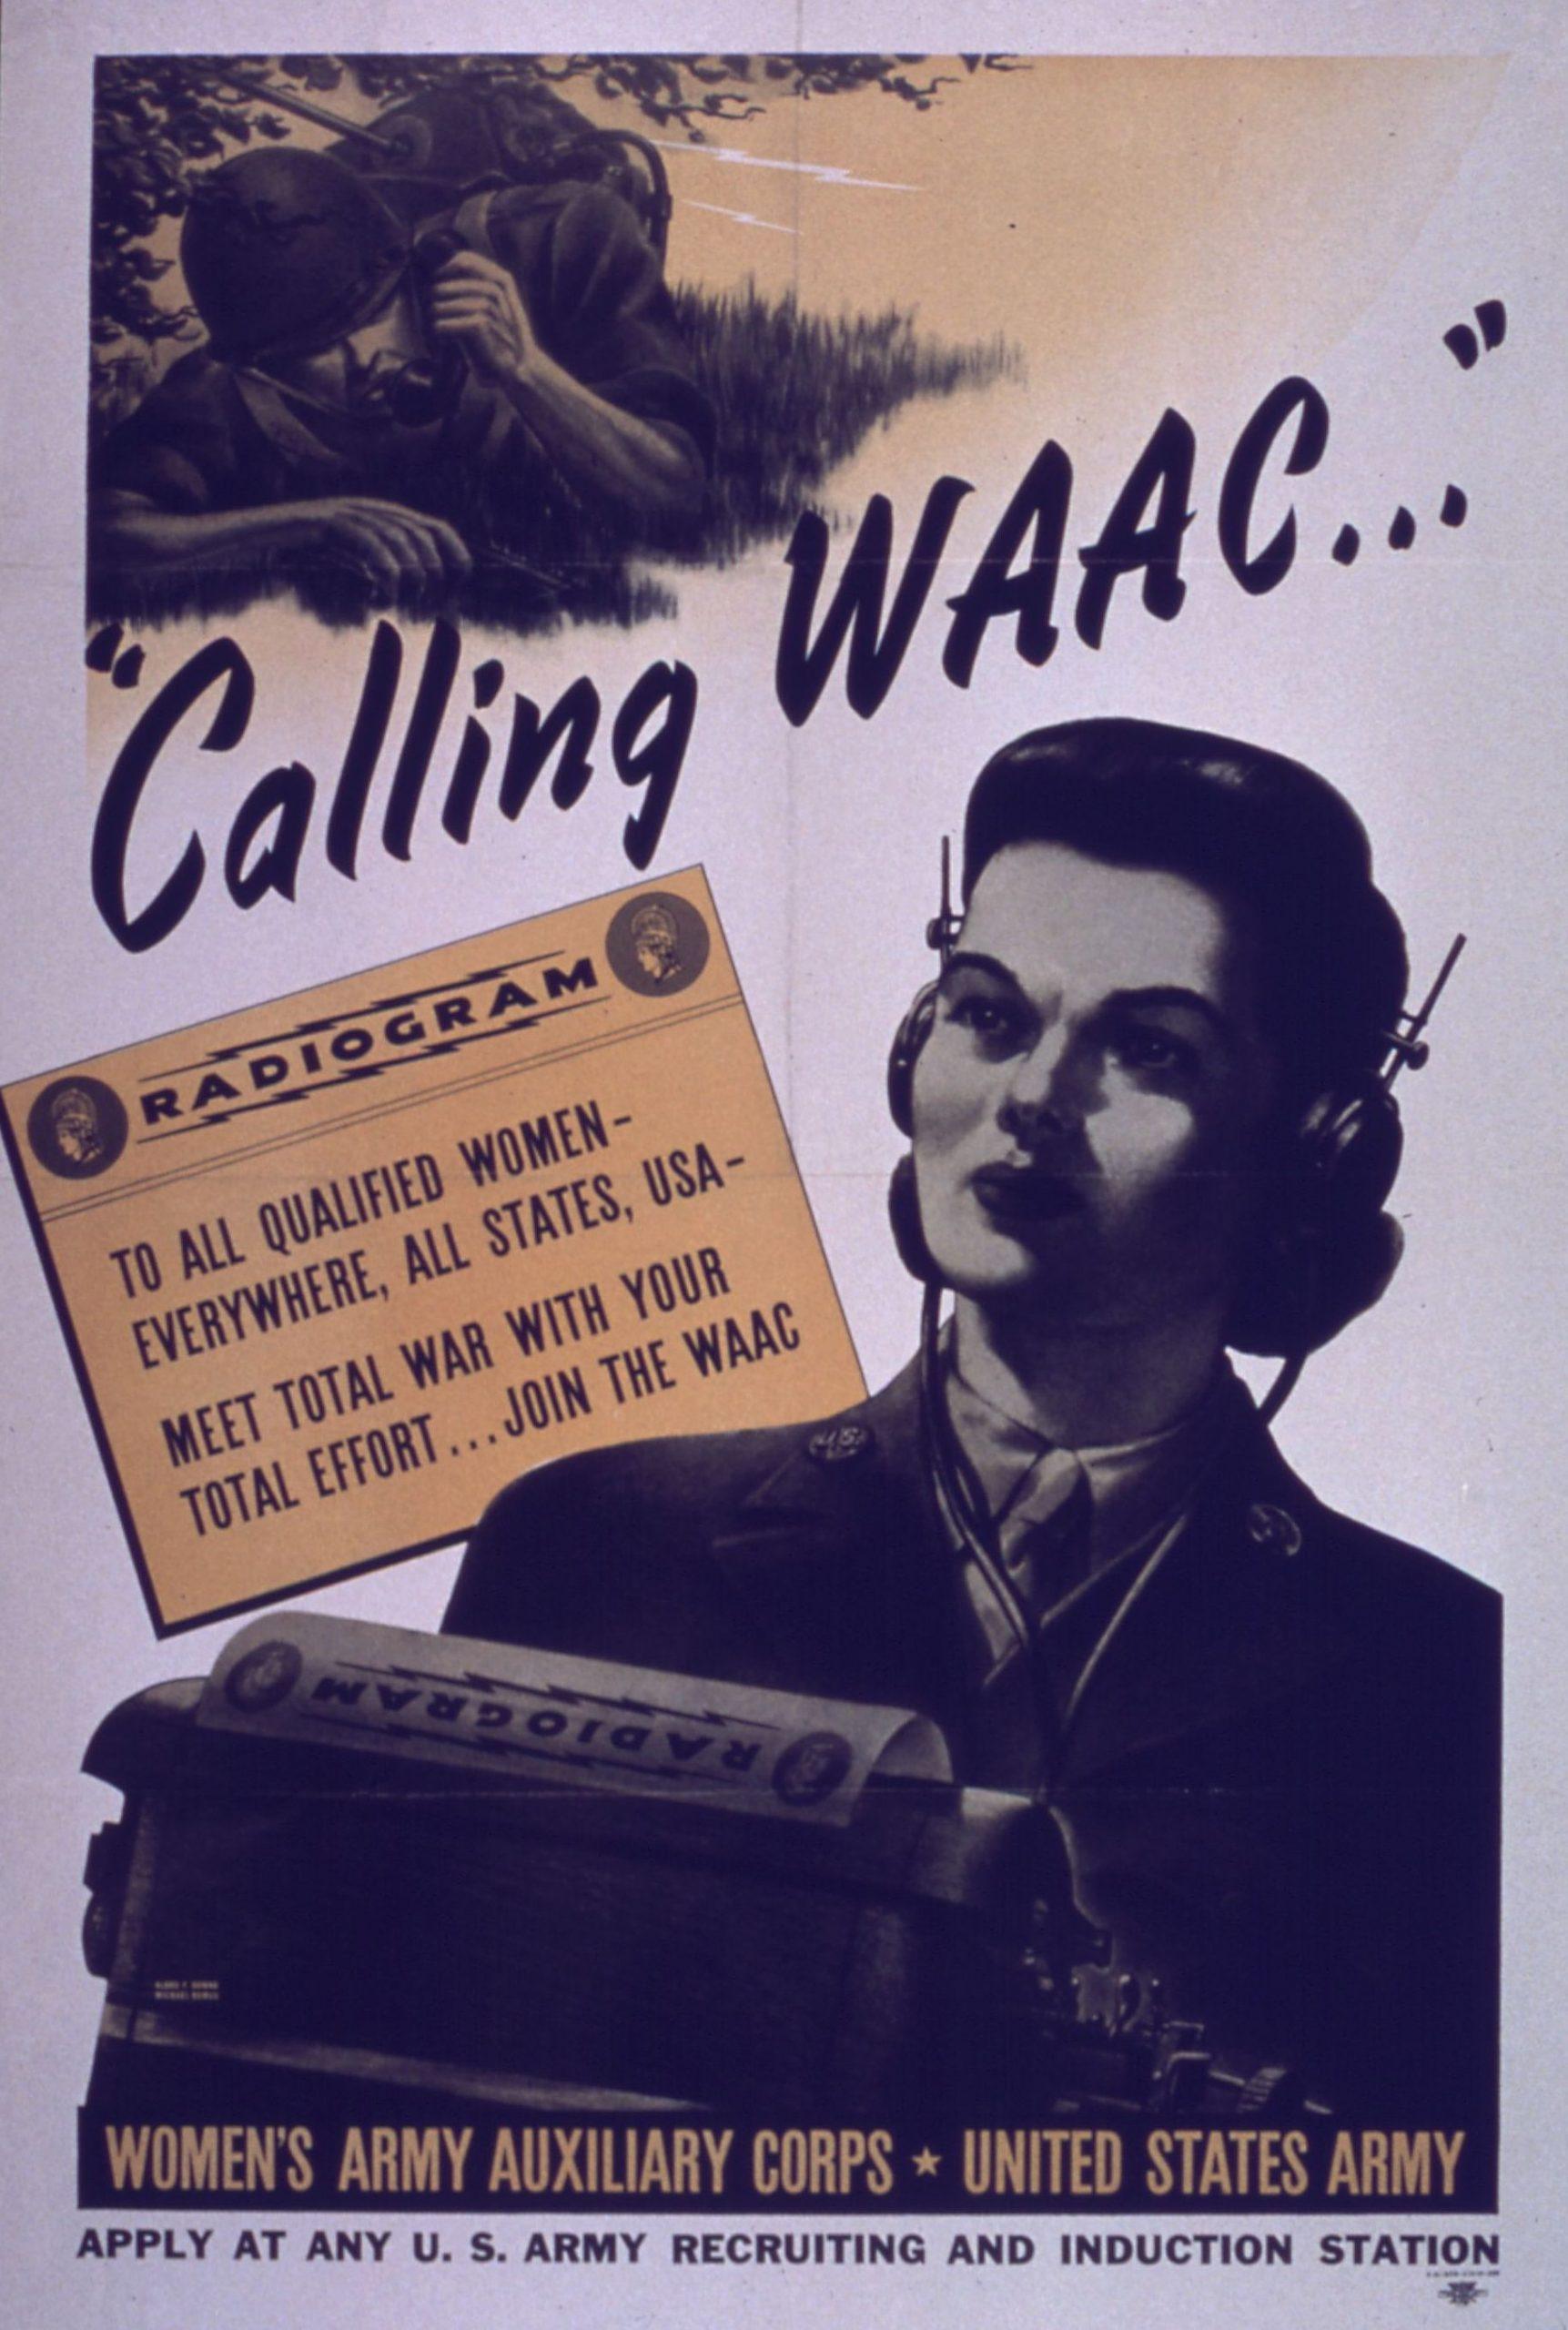 Calling WAAC poster